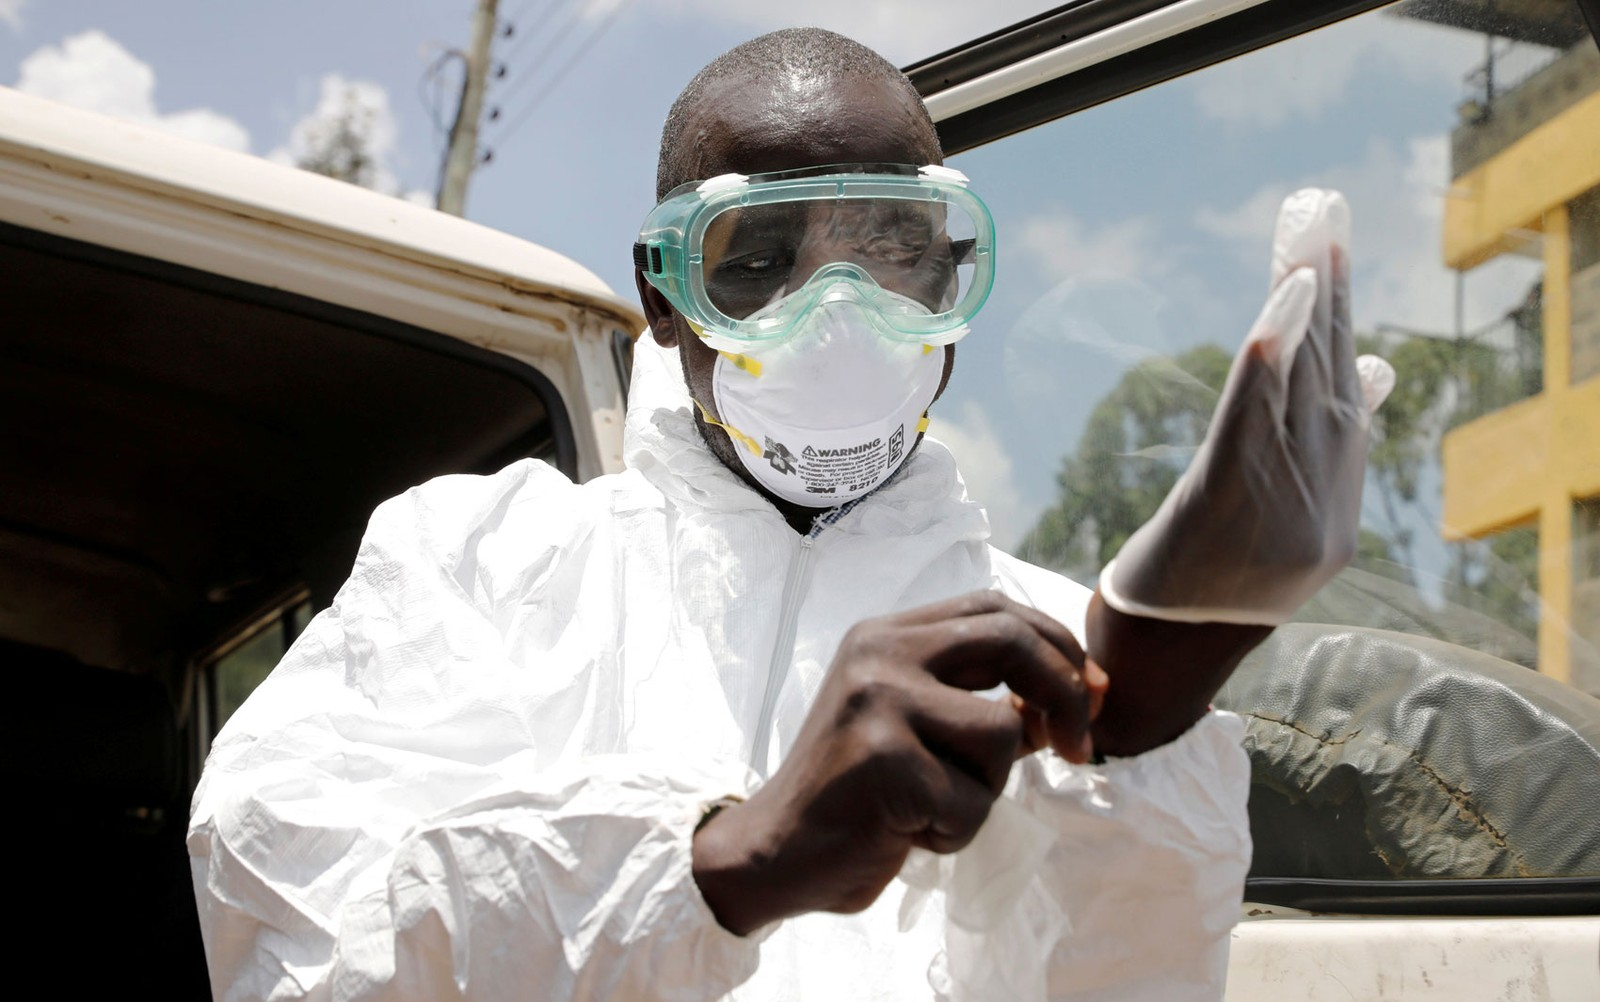 Países africanos fecham fronteiras e cancelam voos para conter coronavírus